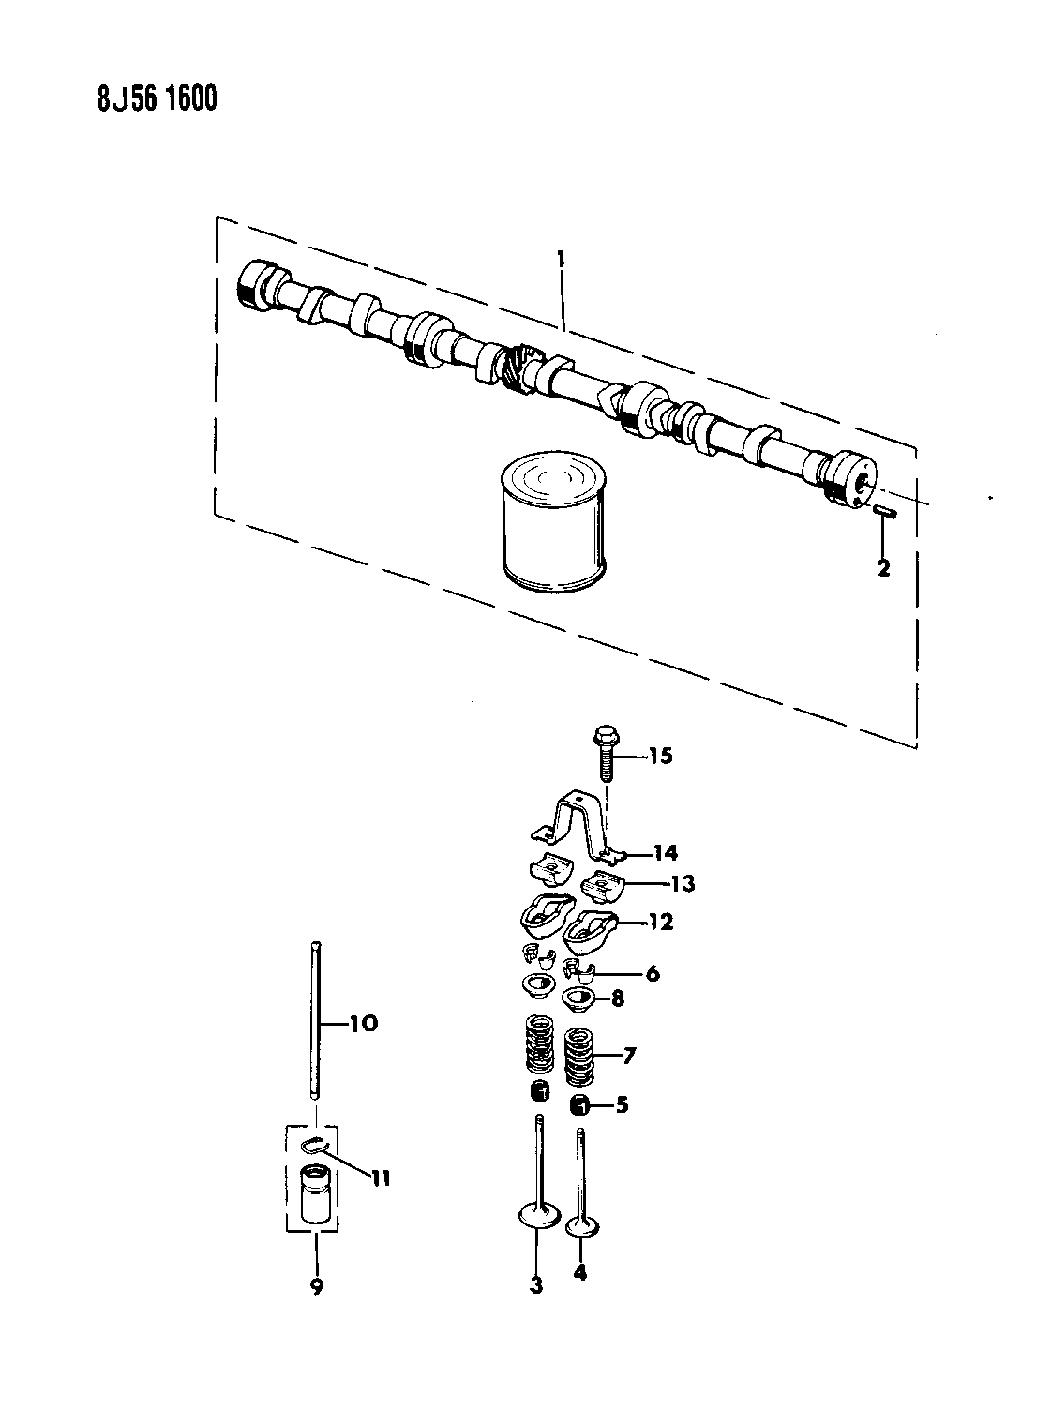 1989 Jeep Wrangler Camshaft Valves Mopar Parts Giant Engine Diagram Thumbnail 2